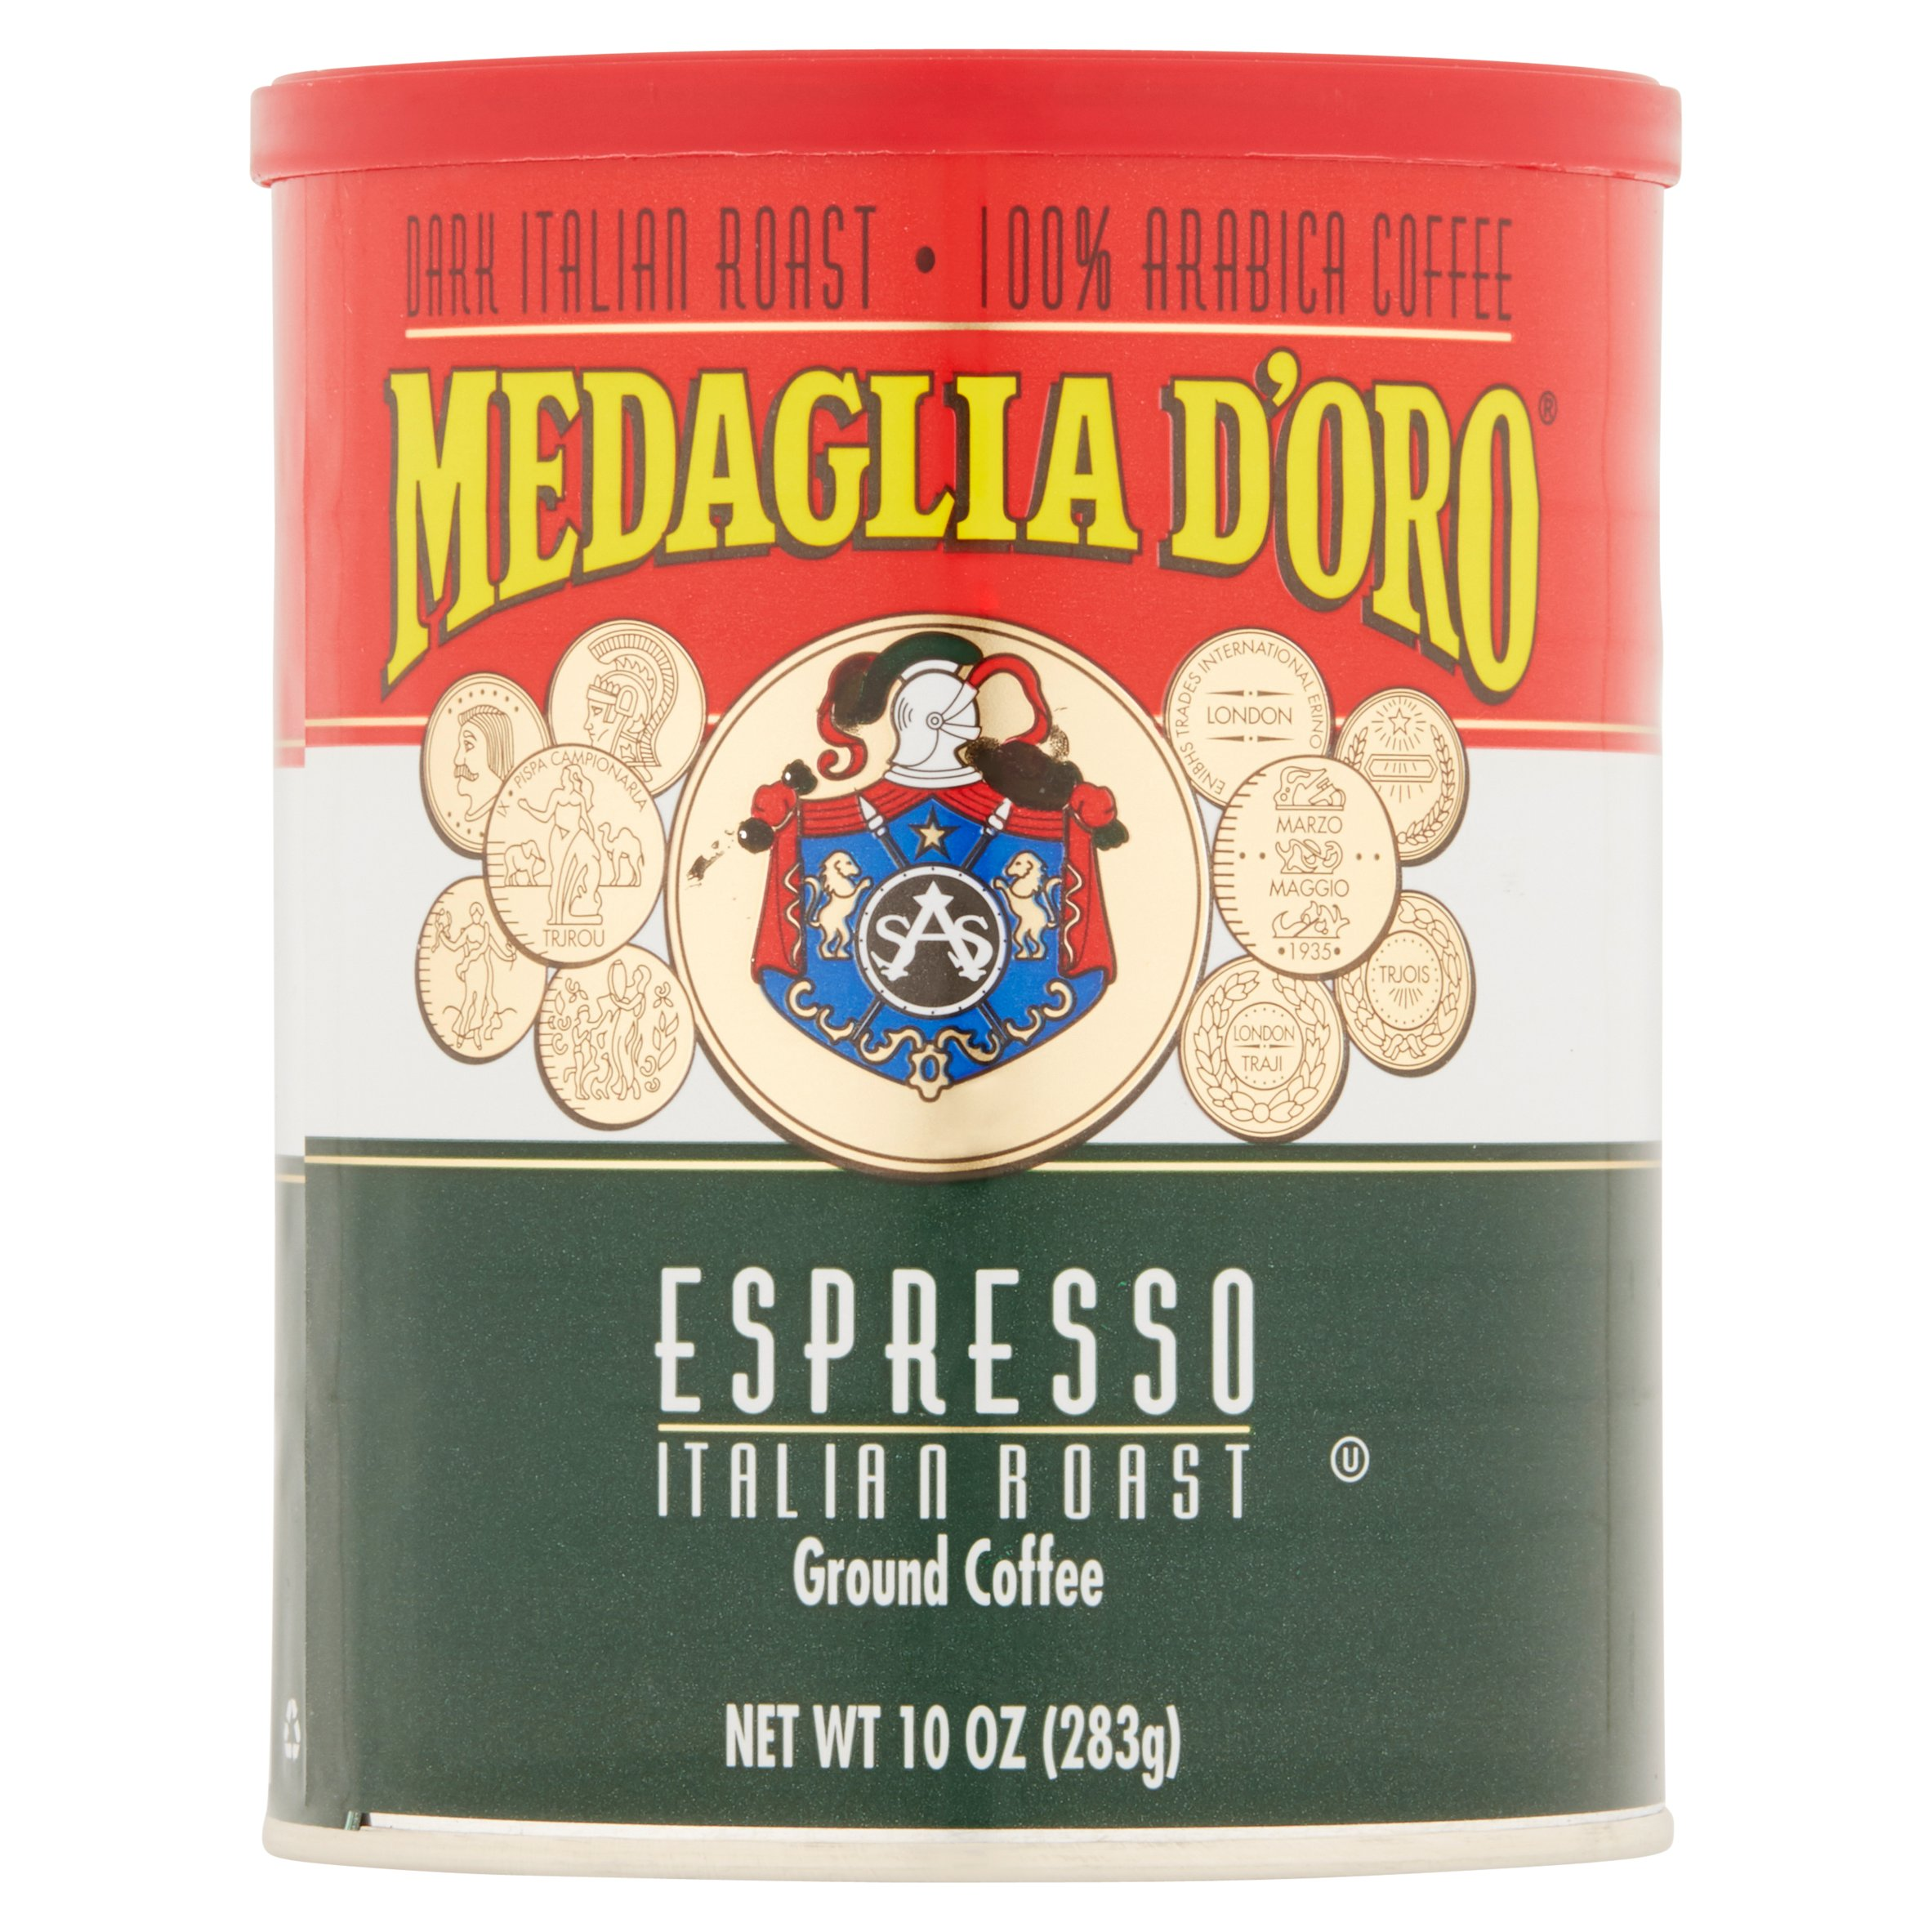 Medaglia d'Oro Caffe Negro Italian Roast Espresso, 10 oz by Rowland Coffee Roasters, Inc.